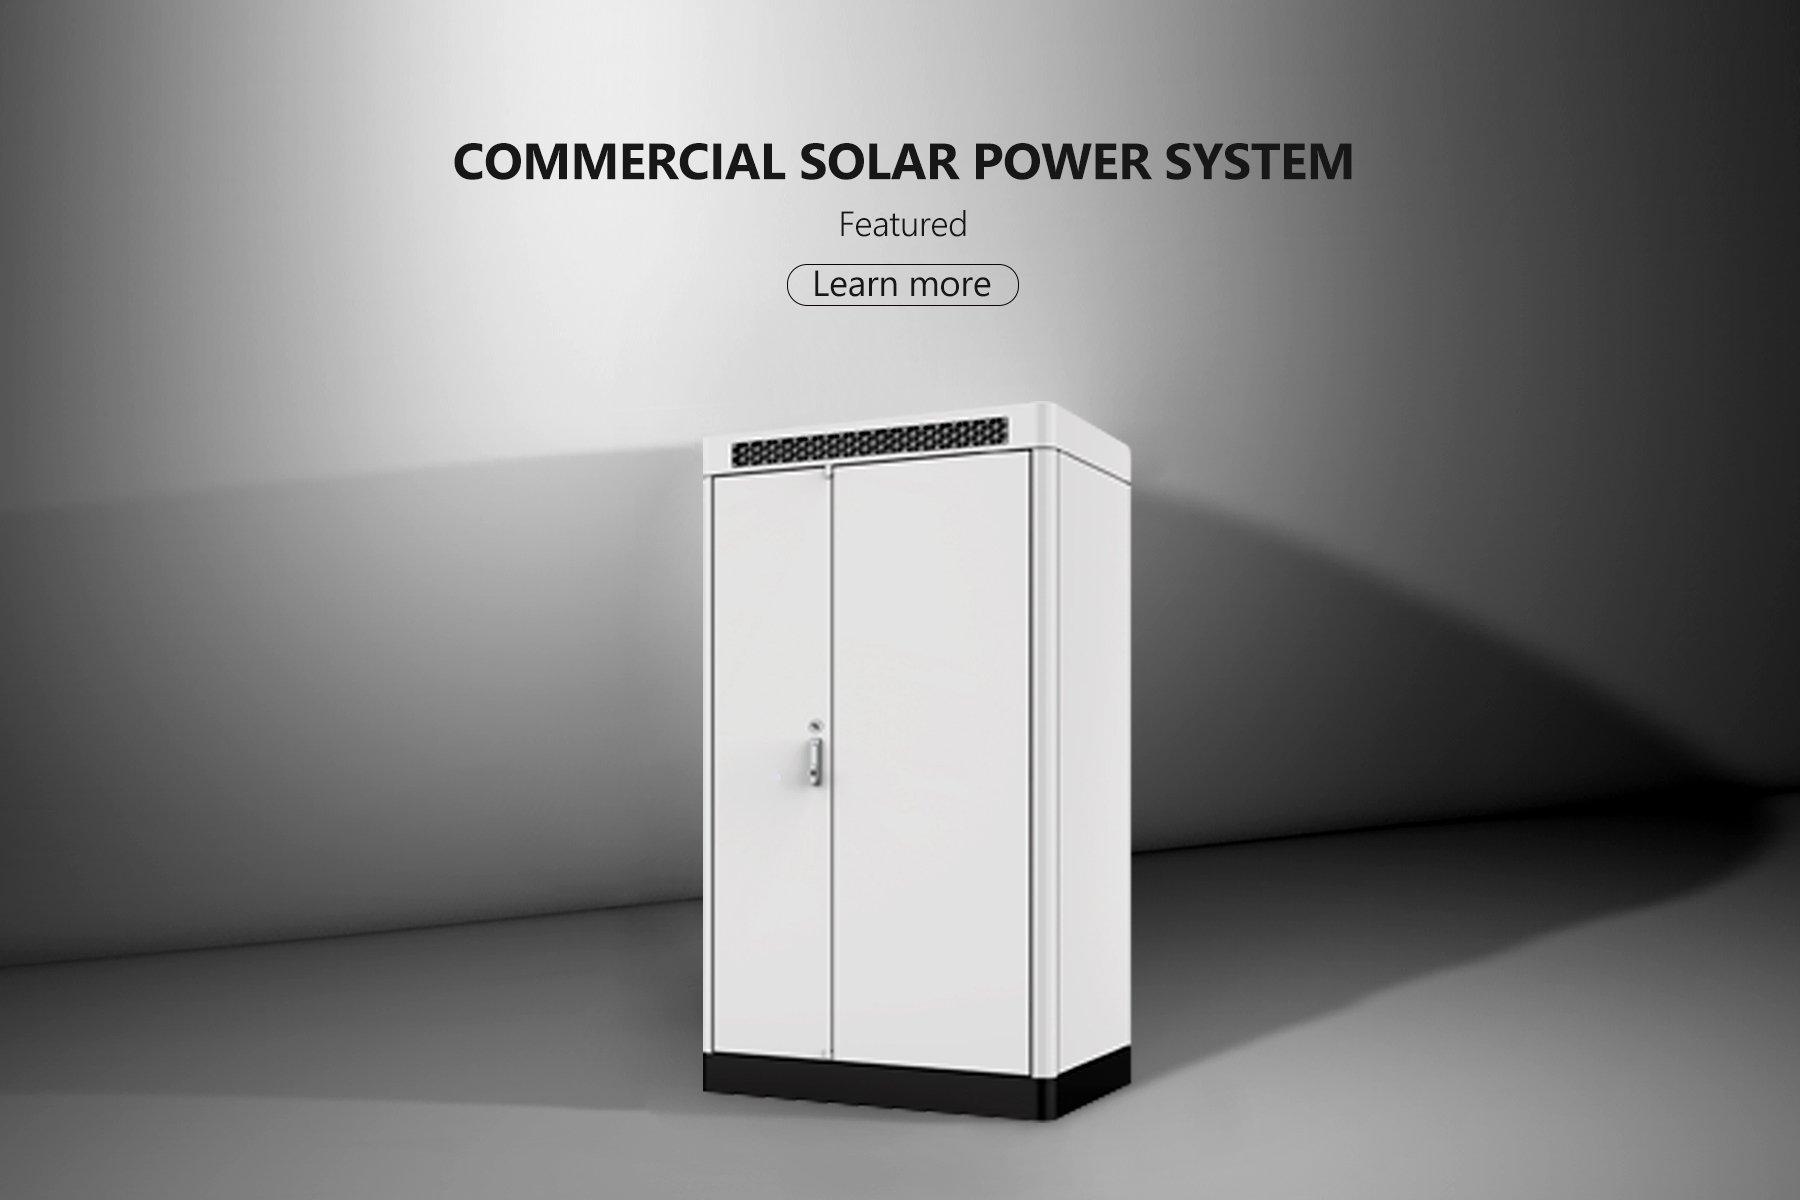 PowerOak Commercial Solar Power System